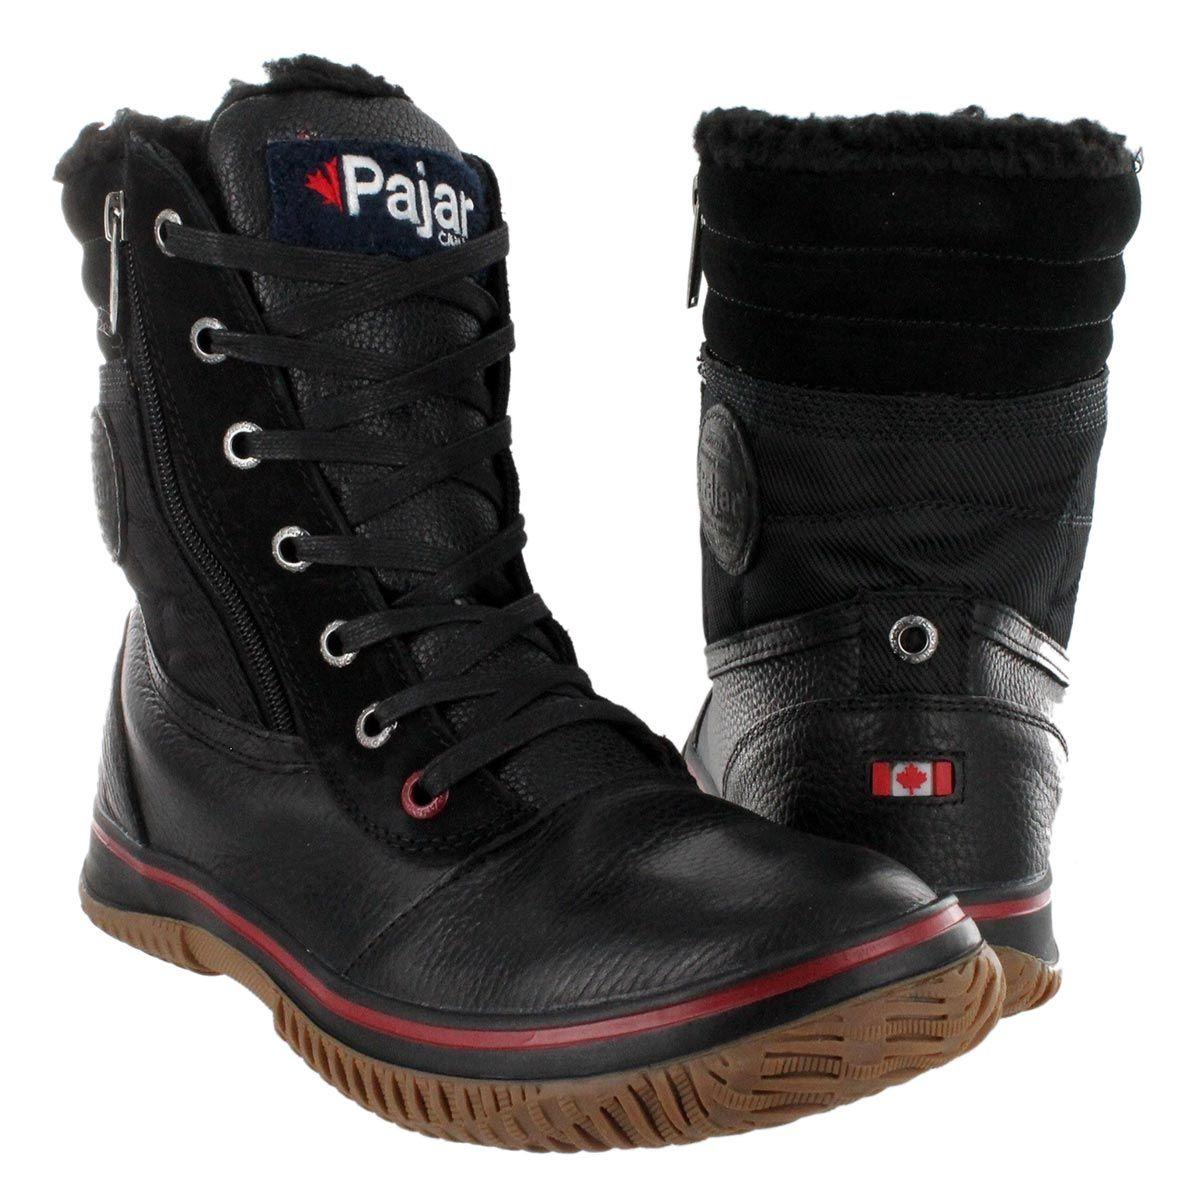 Pajar winter TROOPER black boots waterproof Men's mid TlJF1Kc